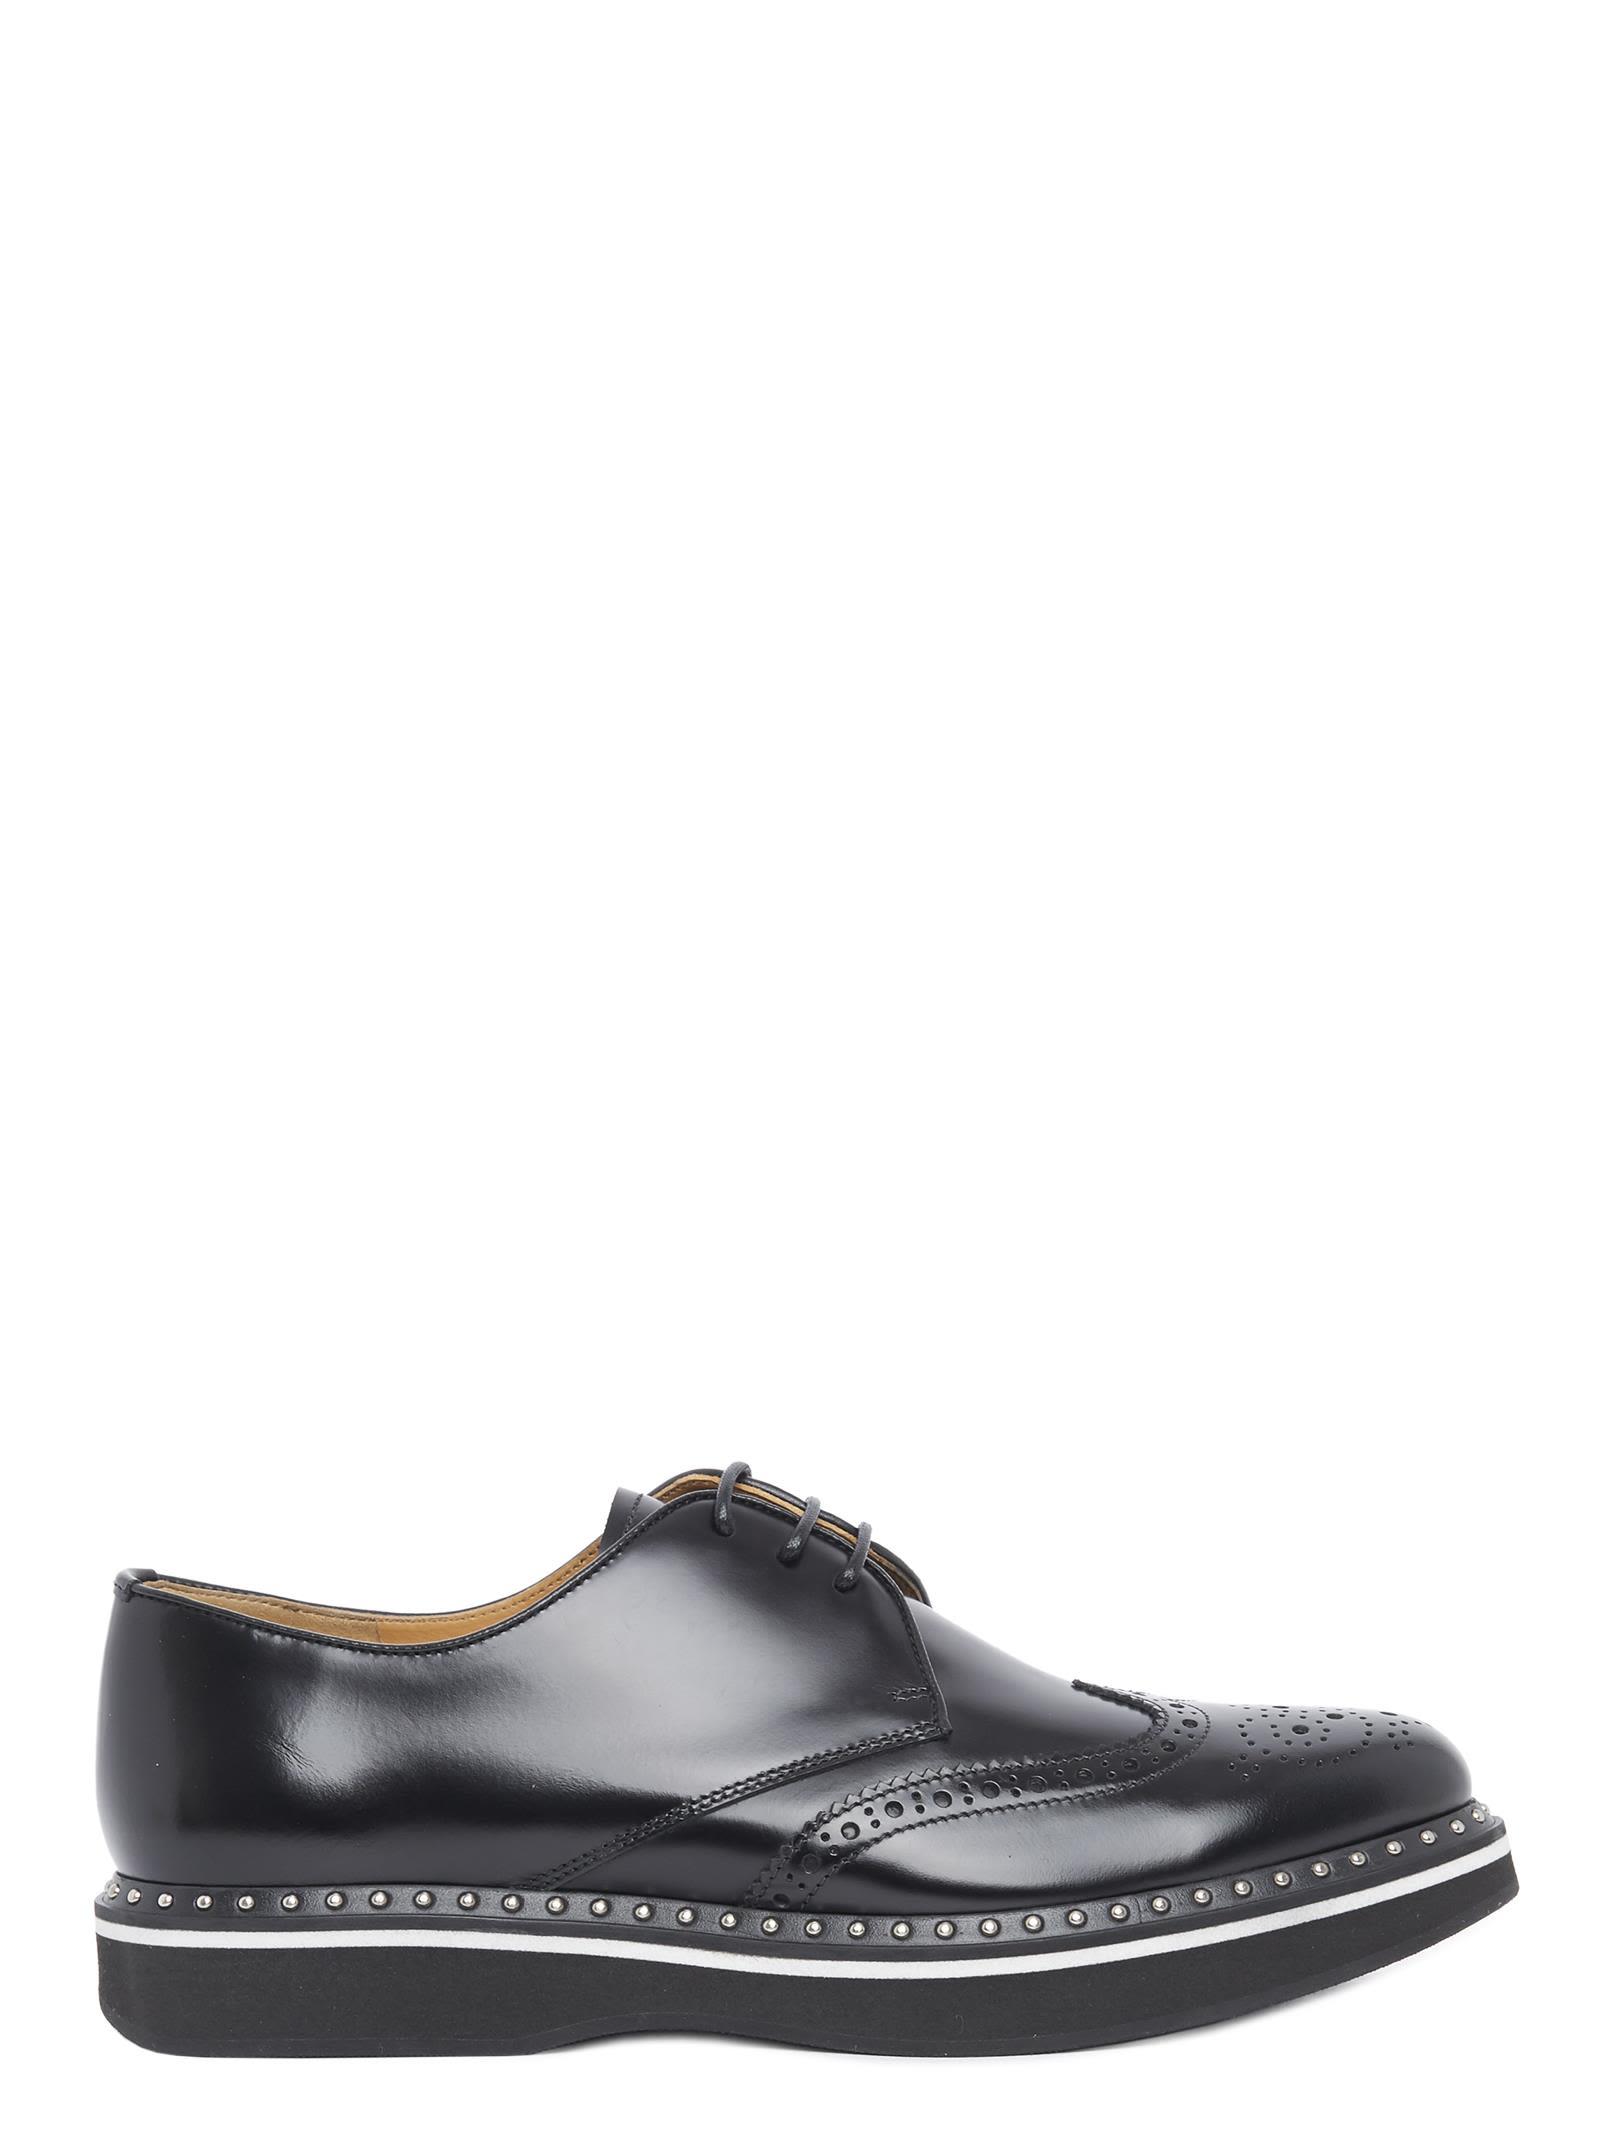 Cheap Sale Sale Nicekicks Cheap Online Church's Tasmin Shoes 7c2V1T4Vg